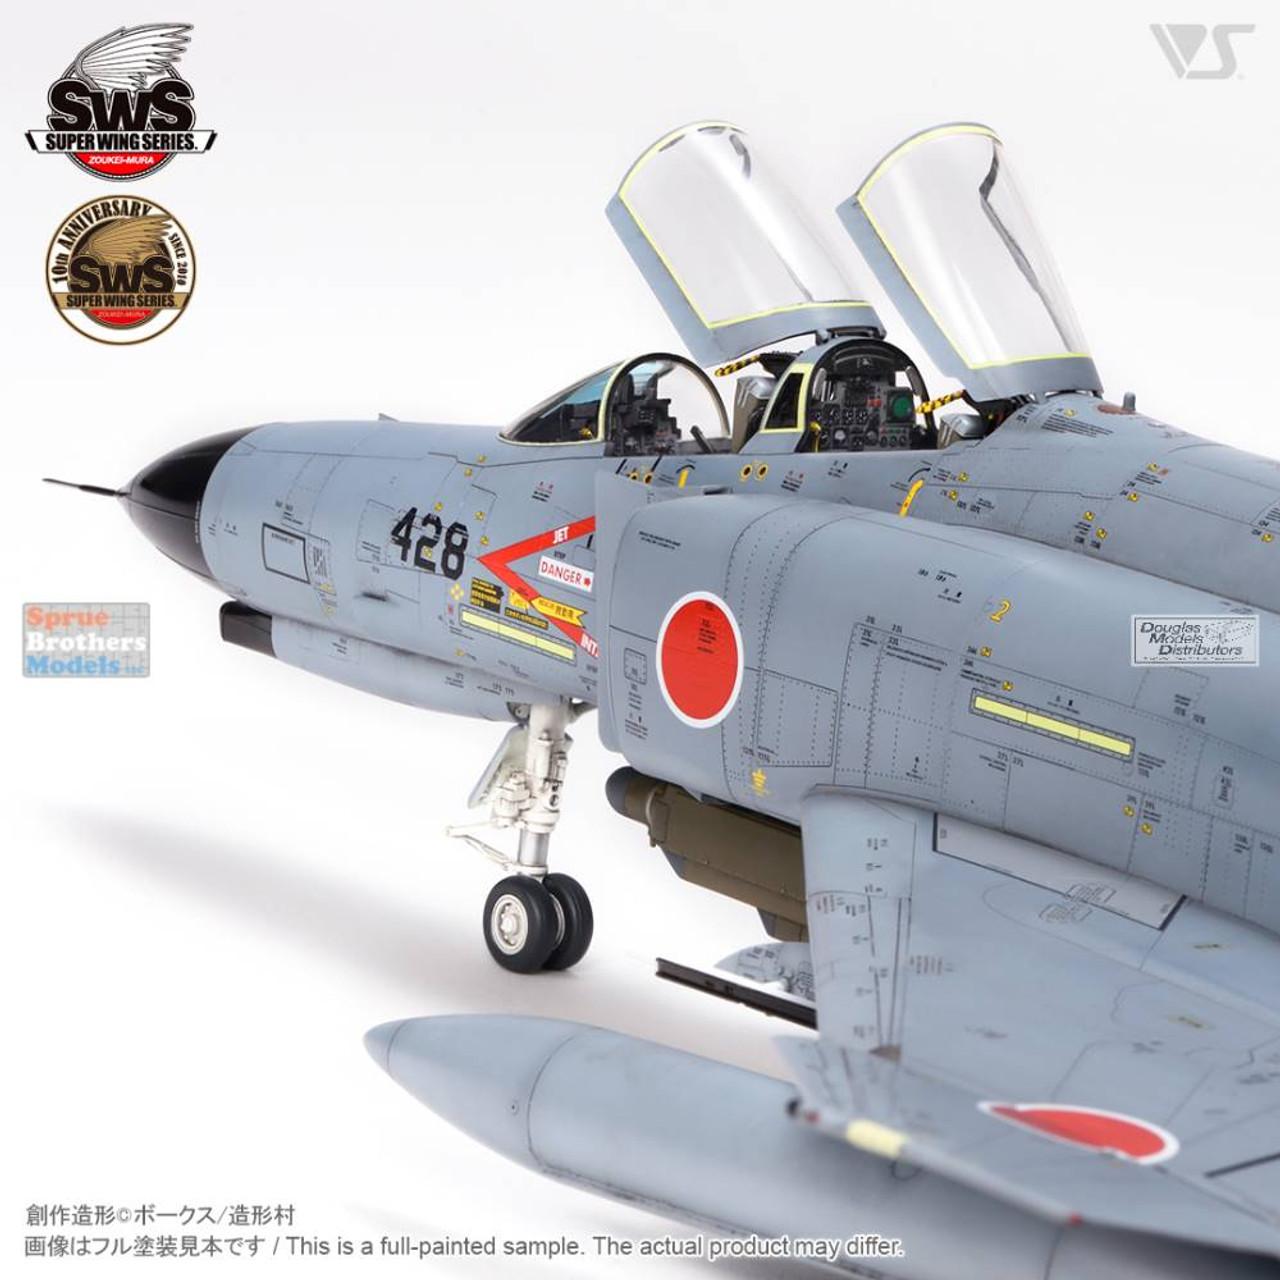 ZKMK30436 1:48 Zoukei-Mura F-4EJ Kai Phantom II